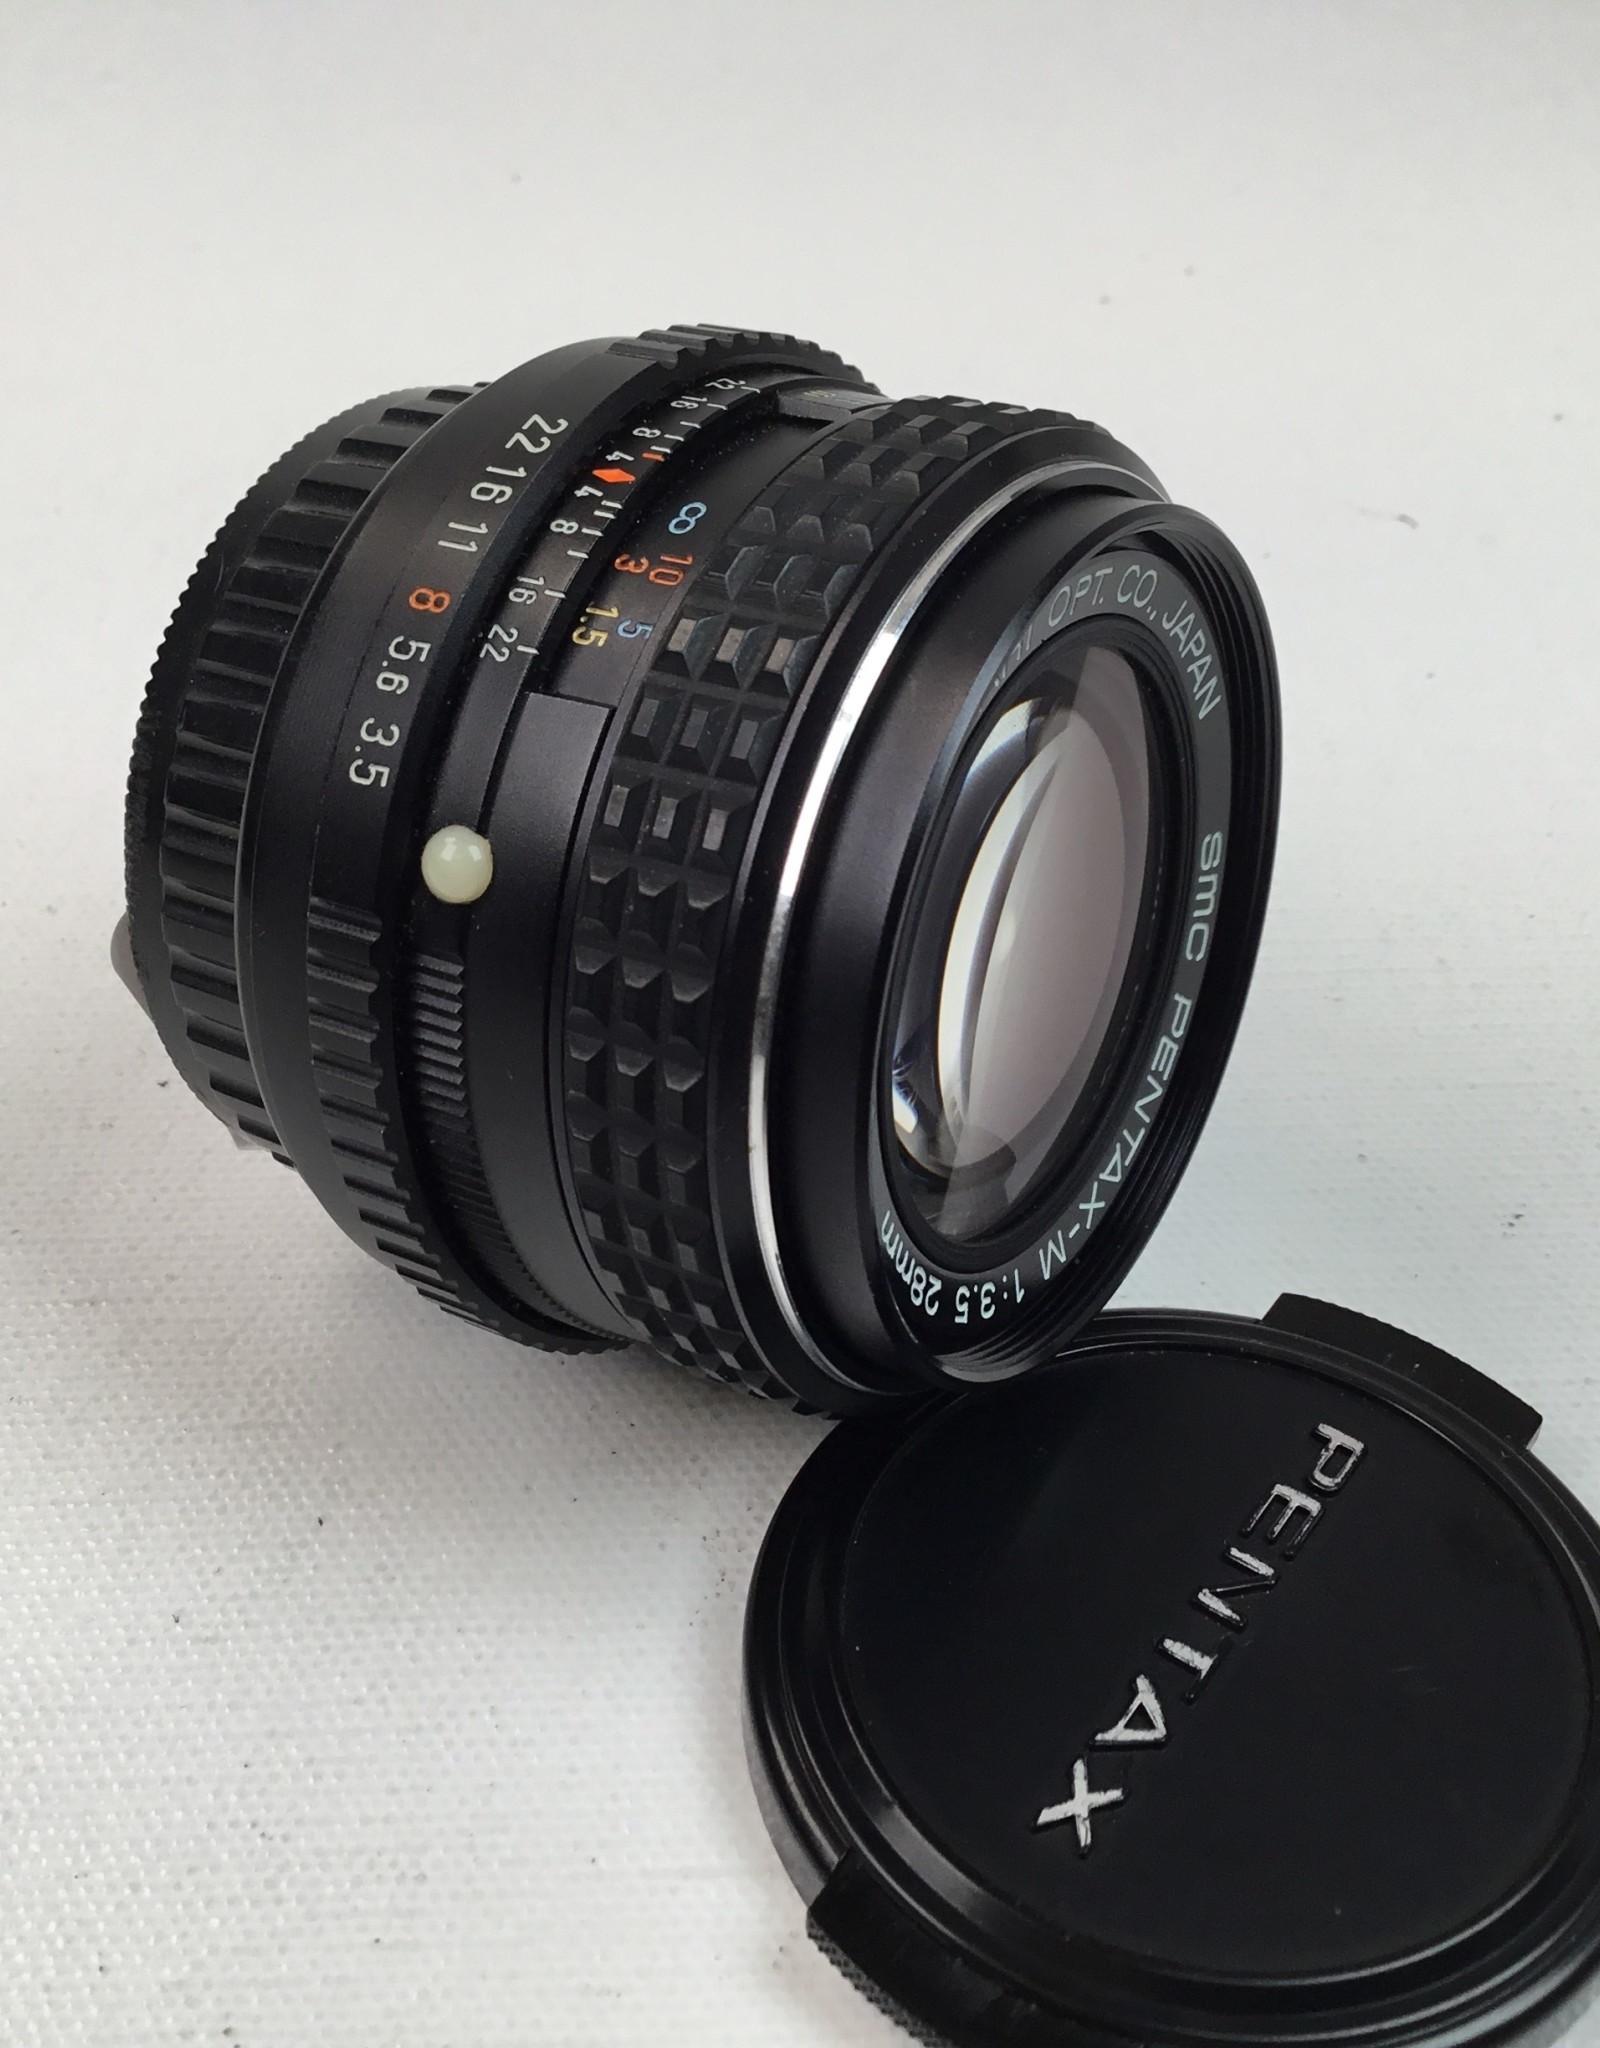 Pentax Pentax SMC  M 28mm f3.5 Lens Used EX